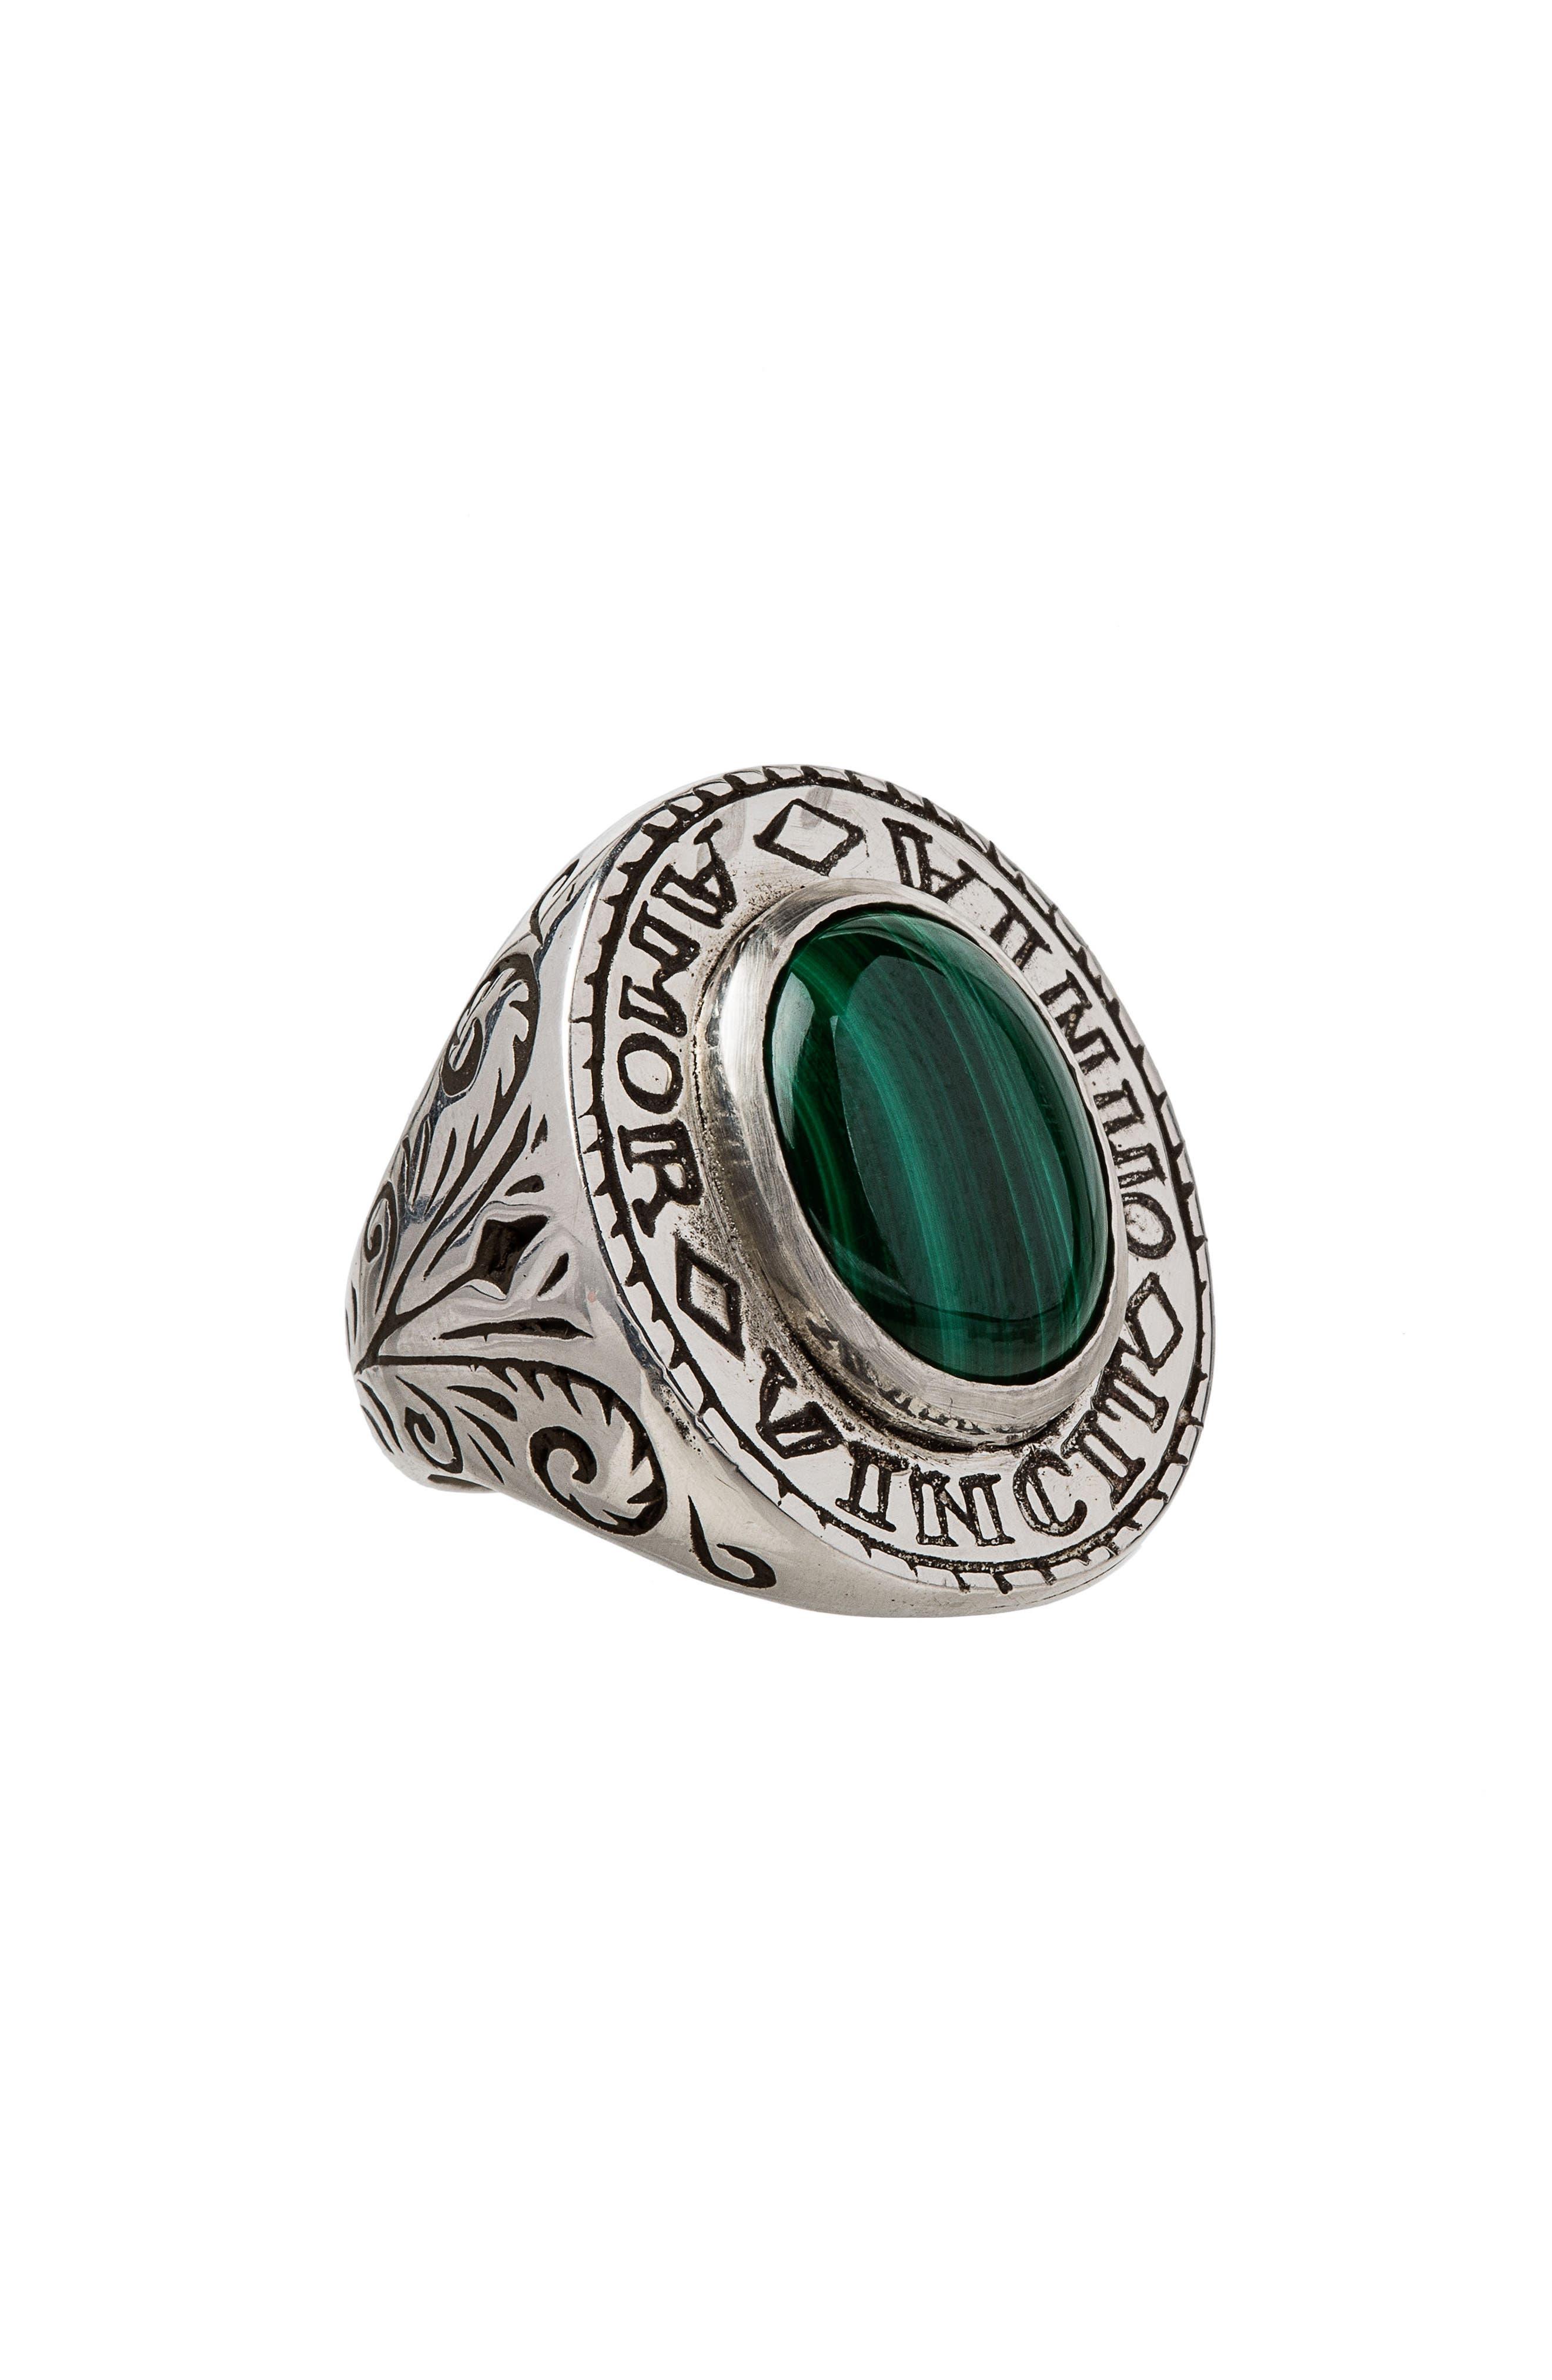 Amor Signet Ring,                             Main thumbnail 1, color,                             300